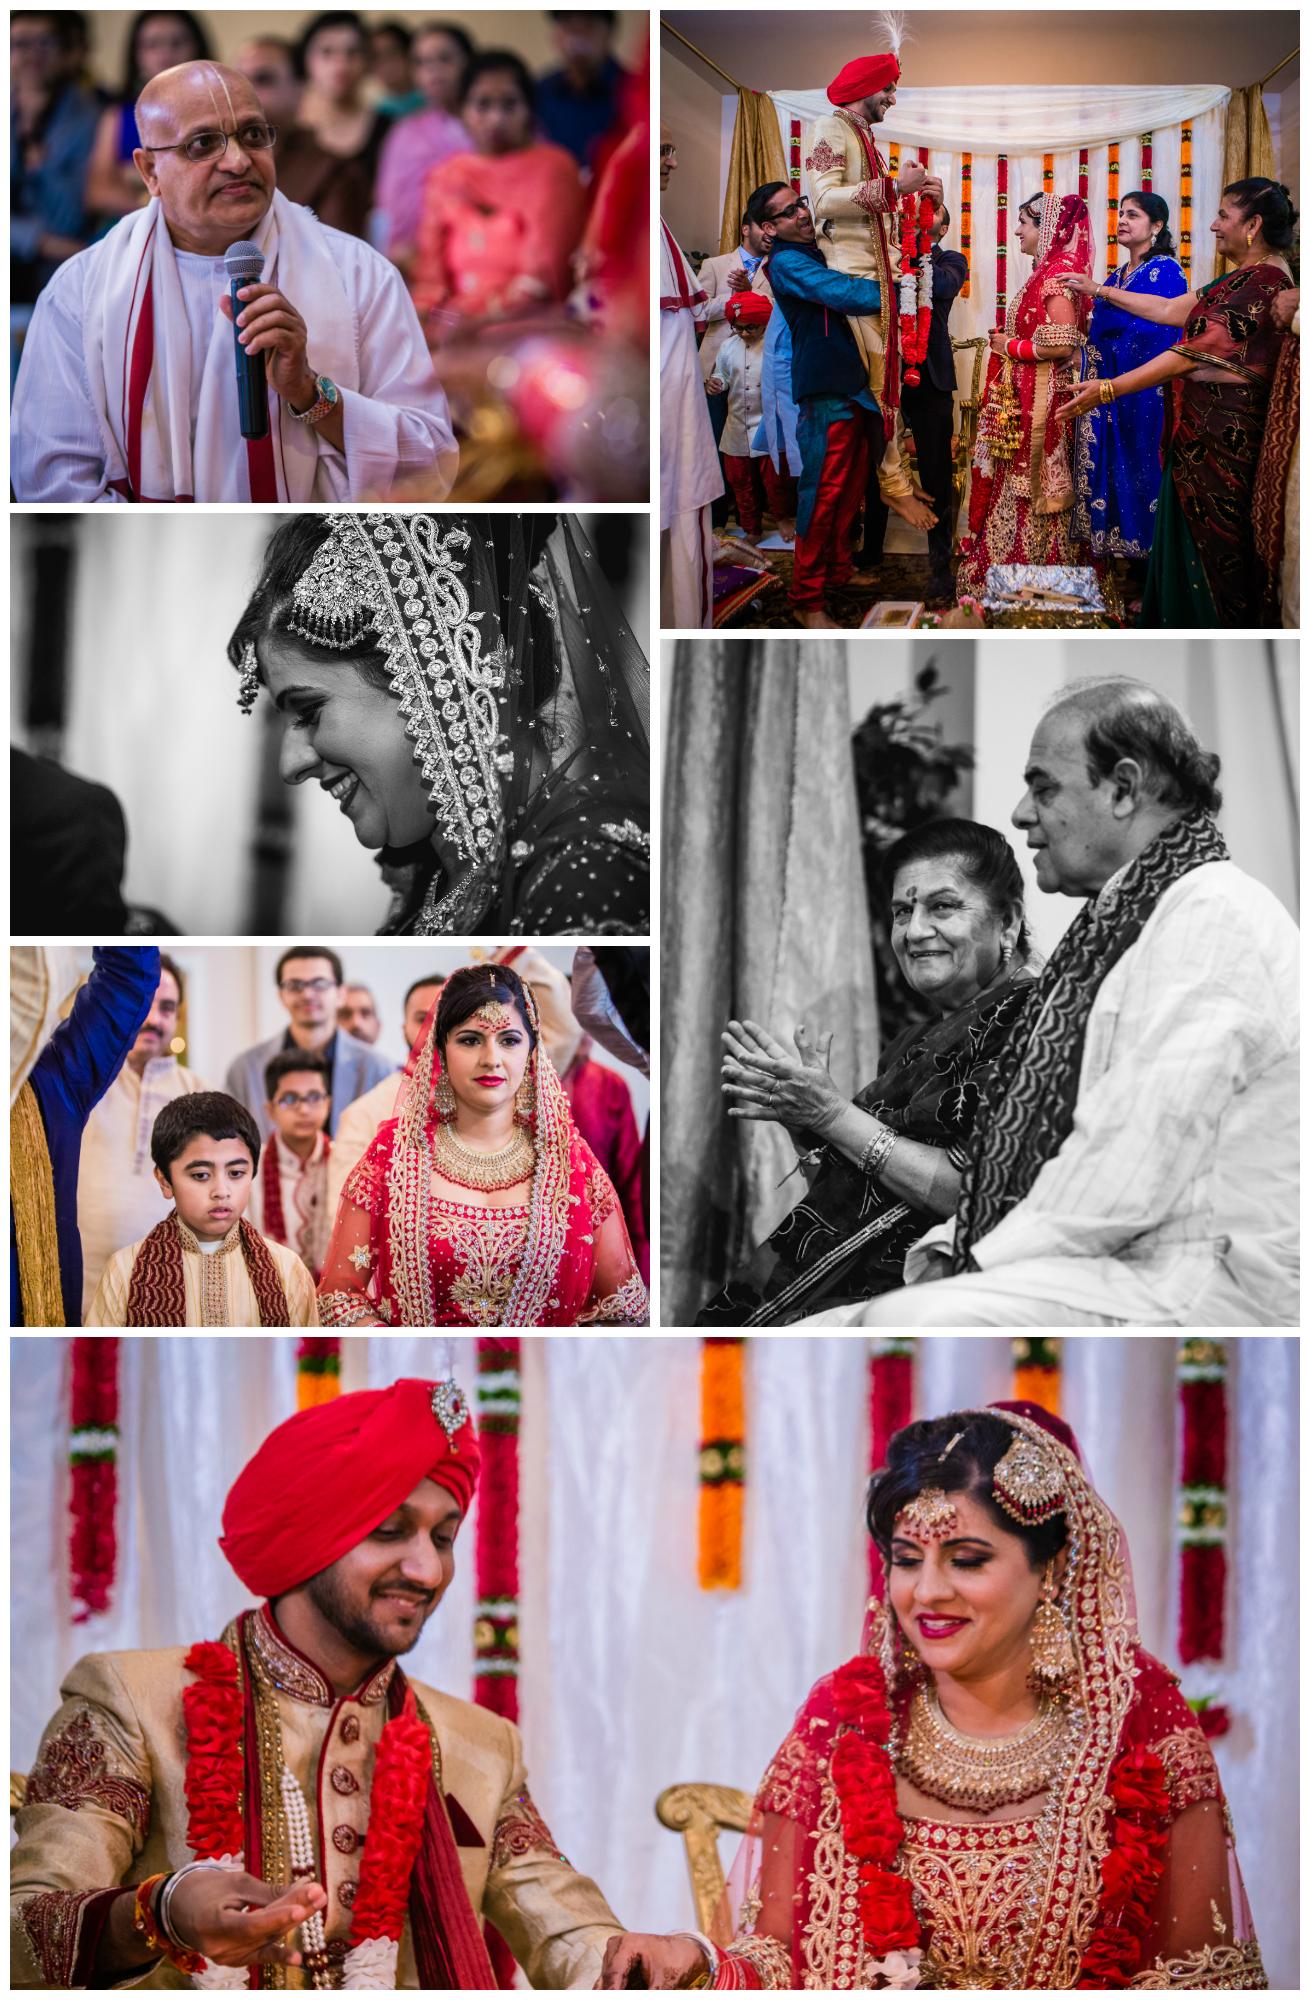 Denver Indian Wedding by JMGant Photography.